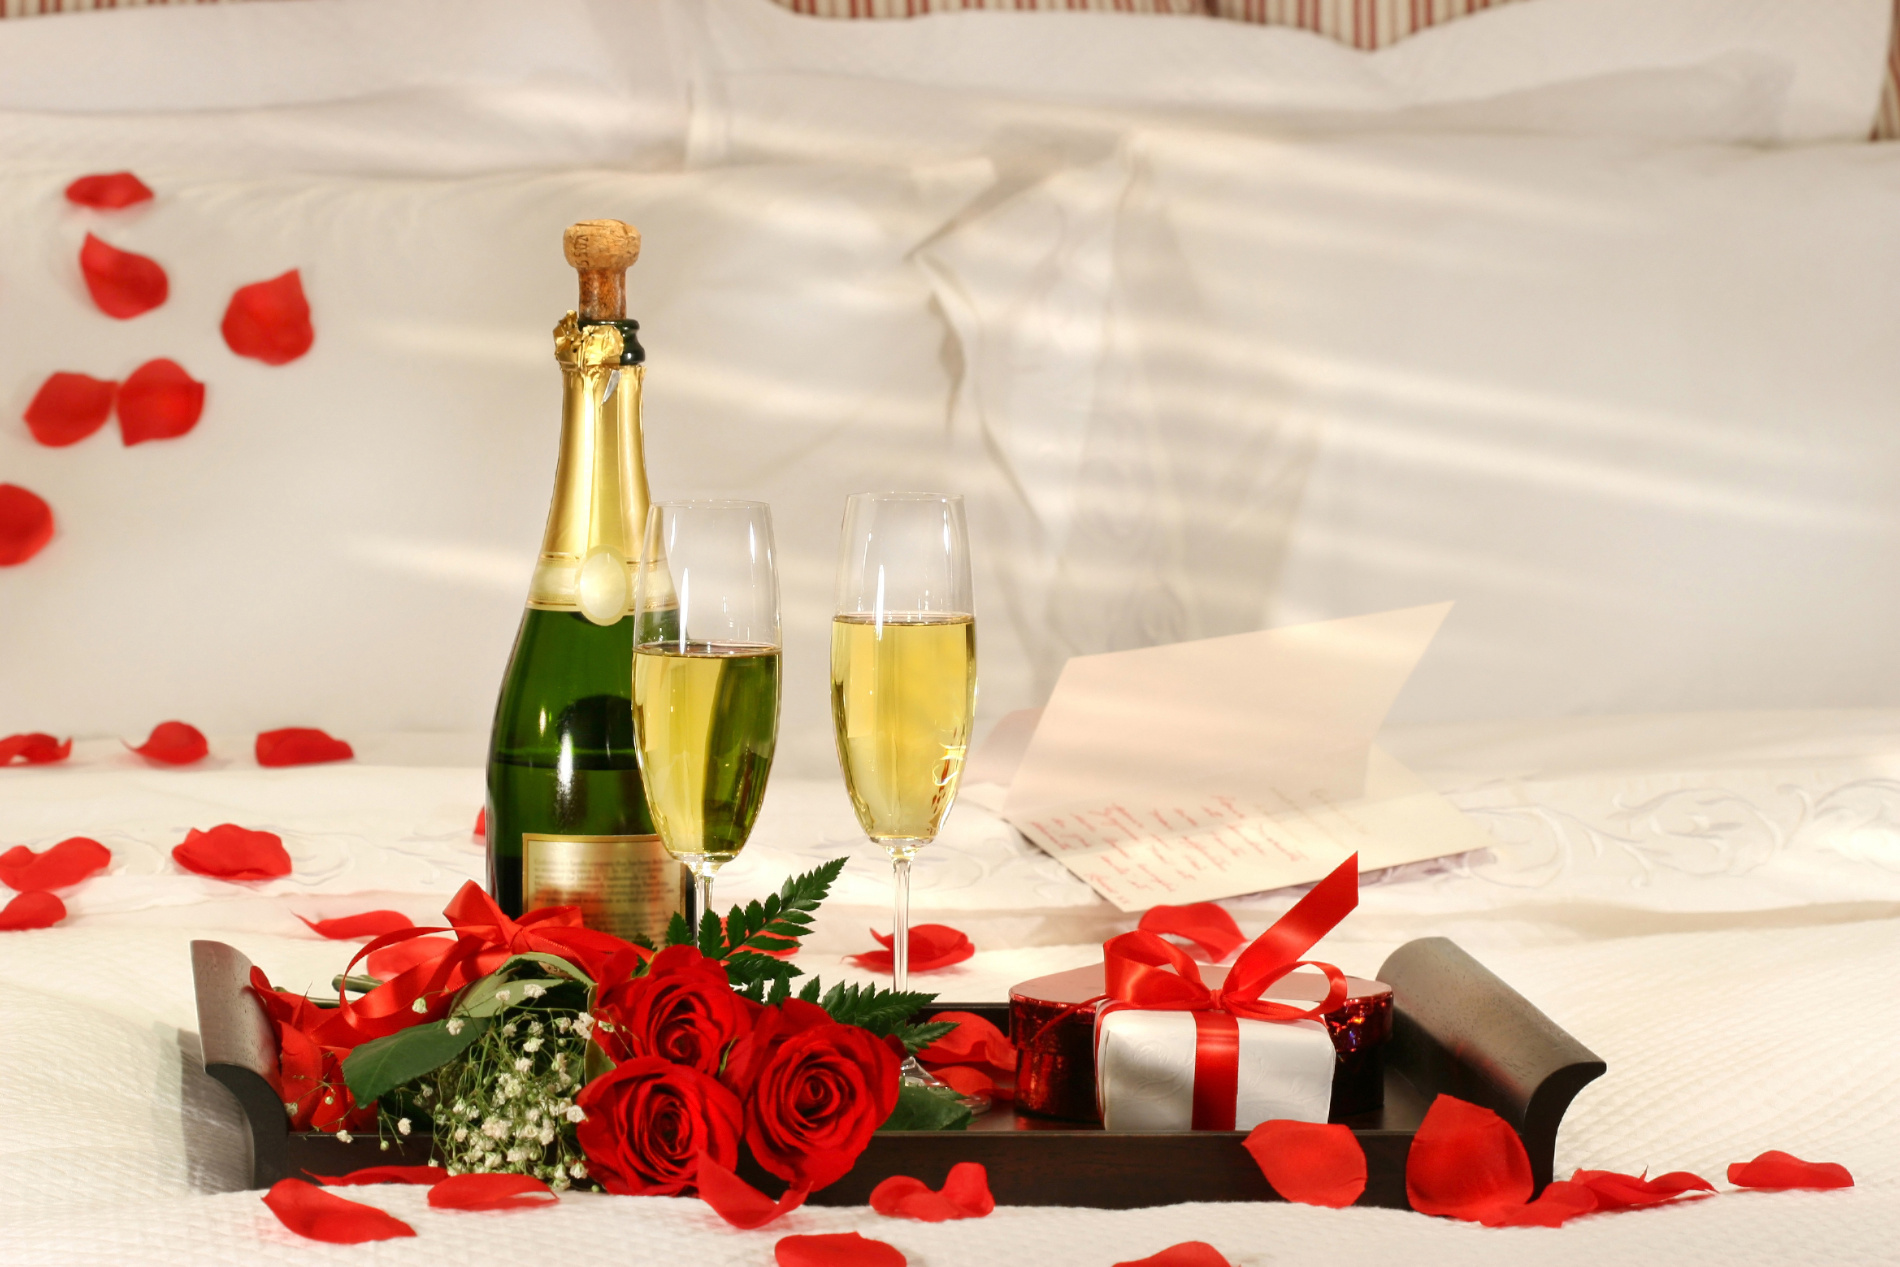 Fines de semana románticos